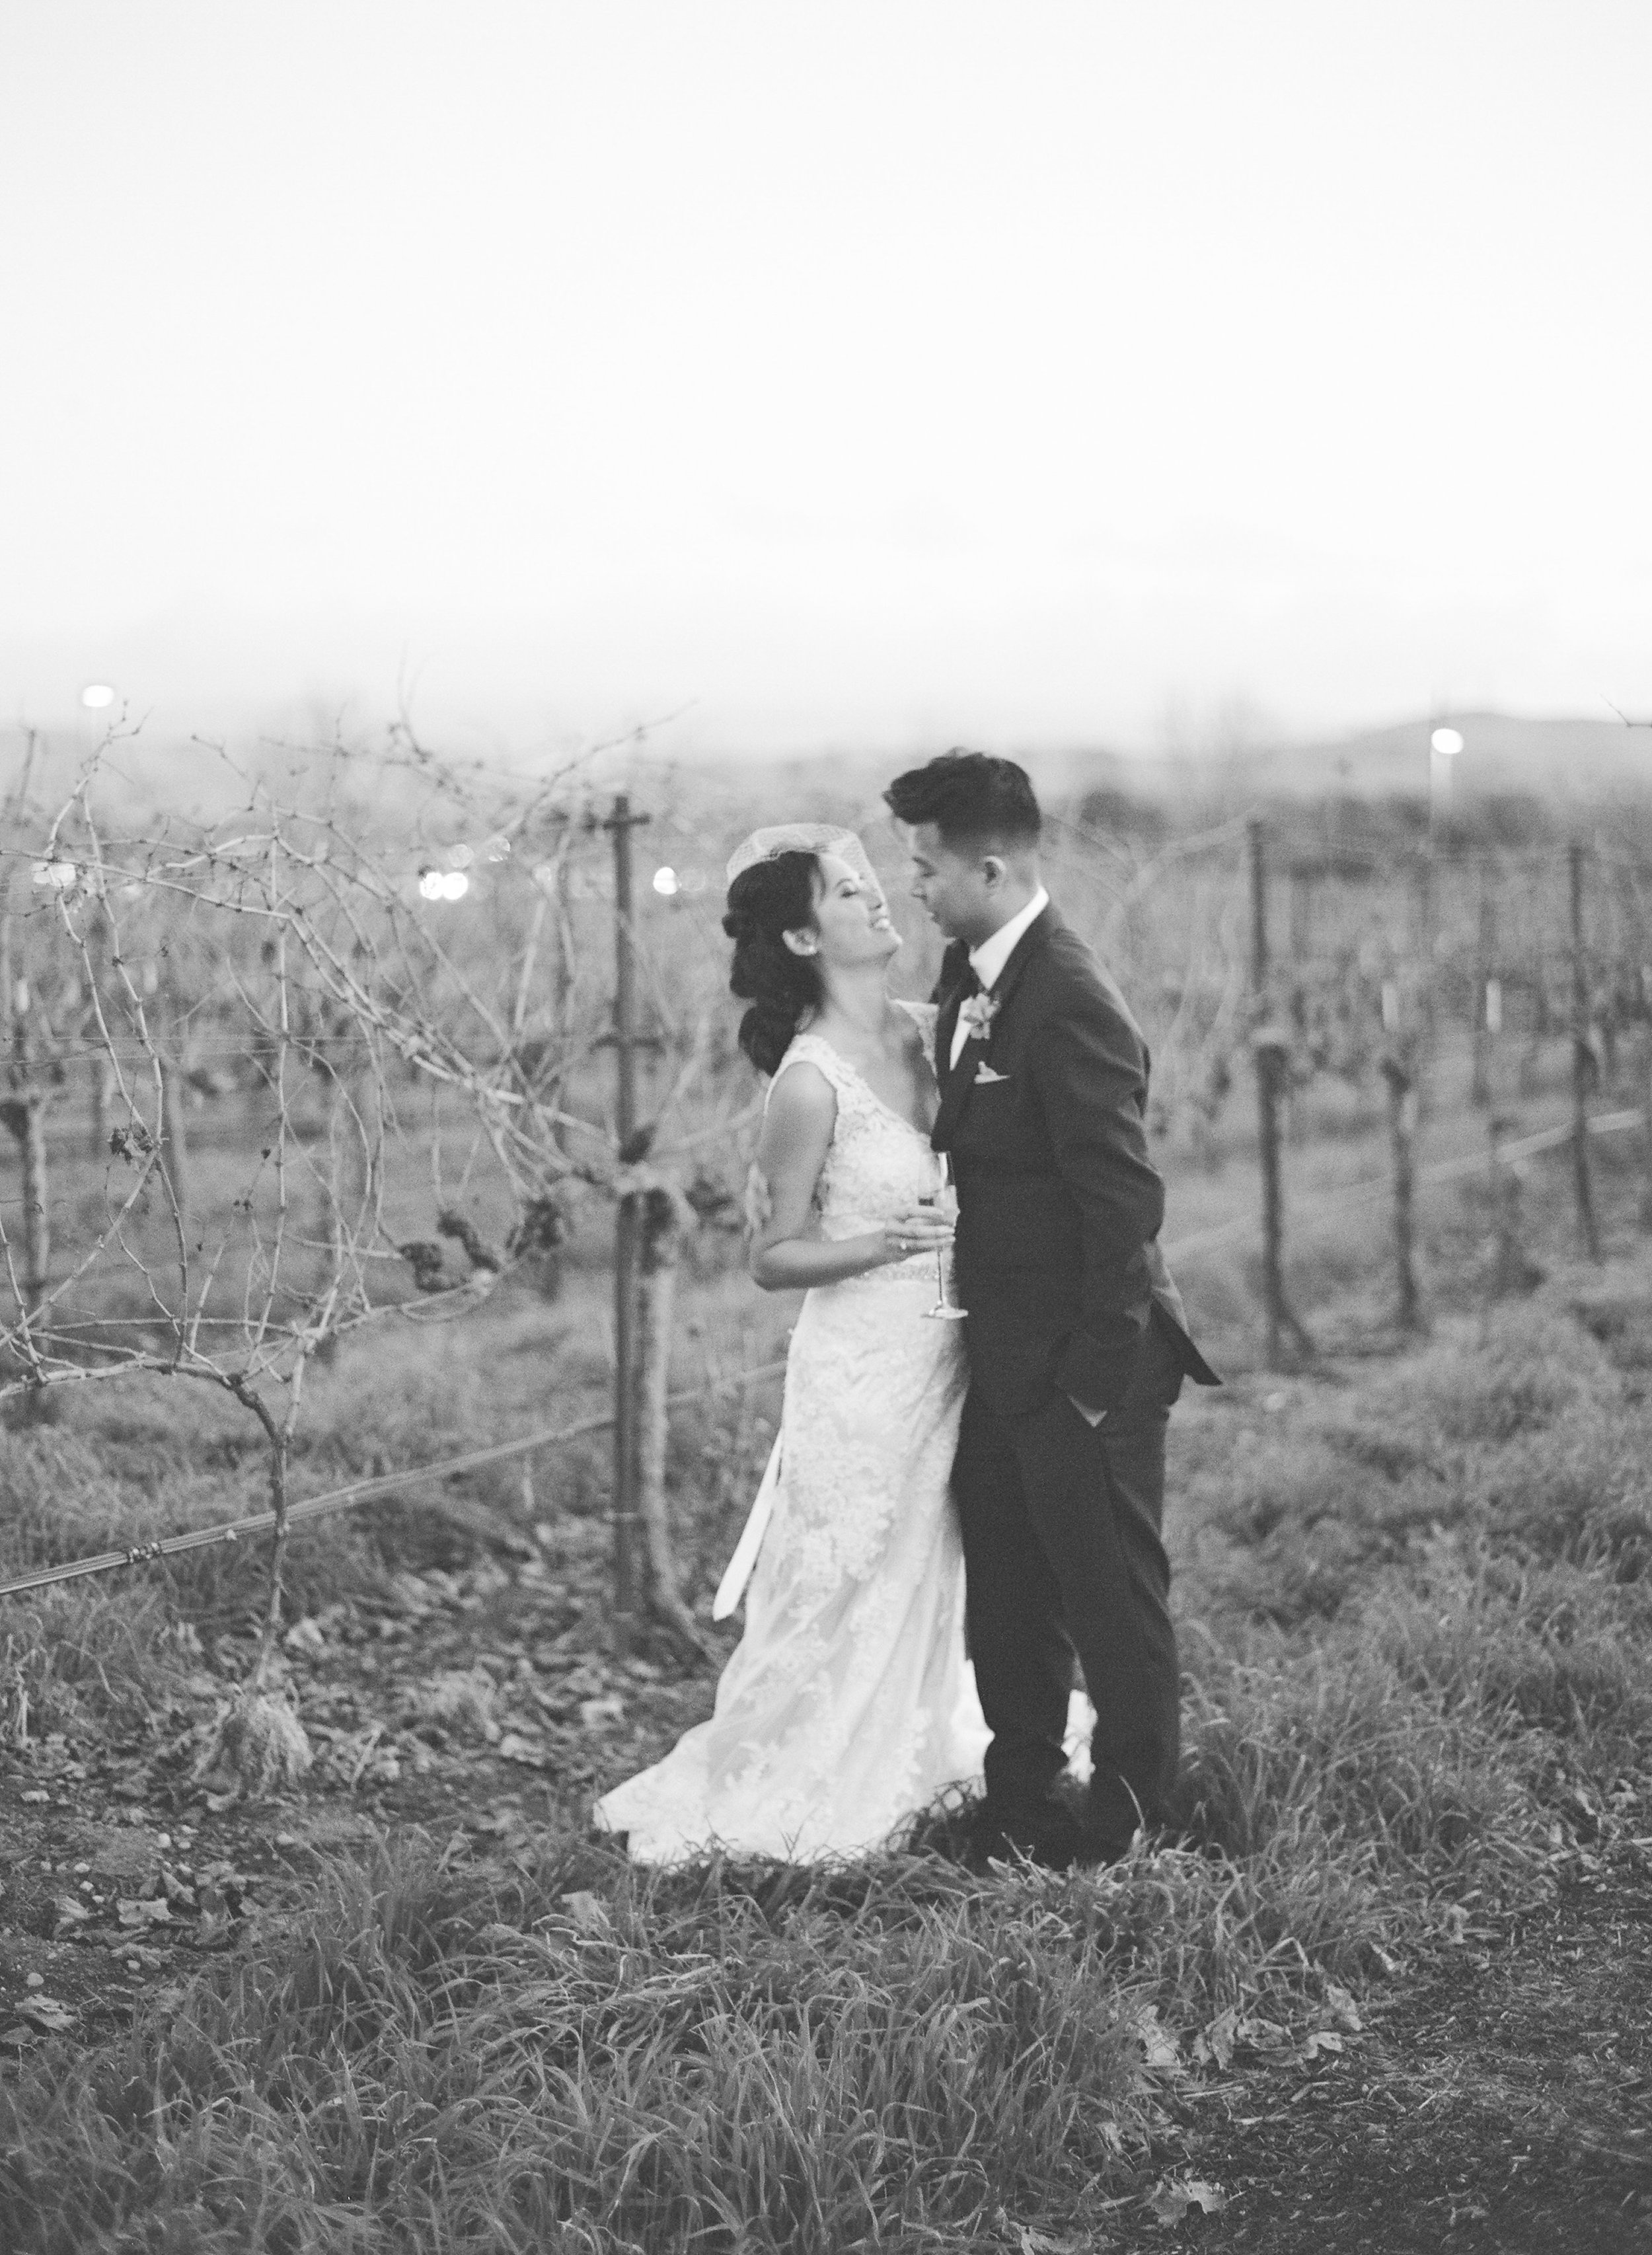 San Francisco Film Photographer Casa Real Destination Wedding Photographer